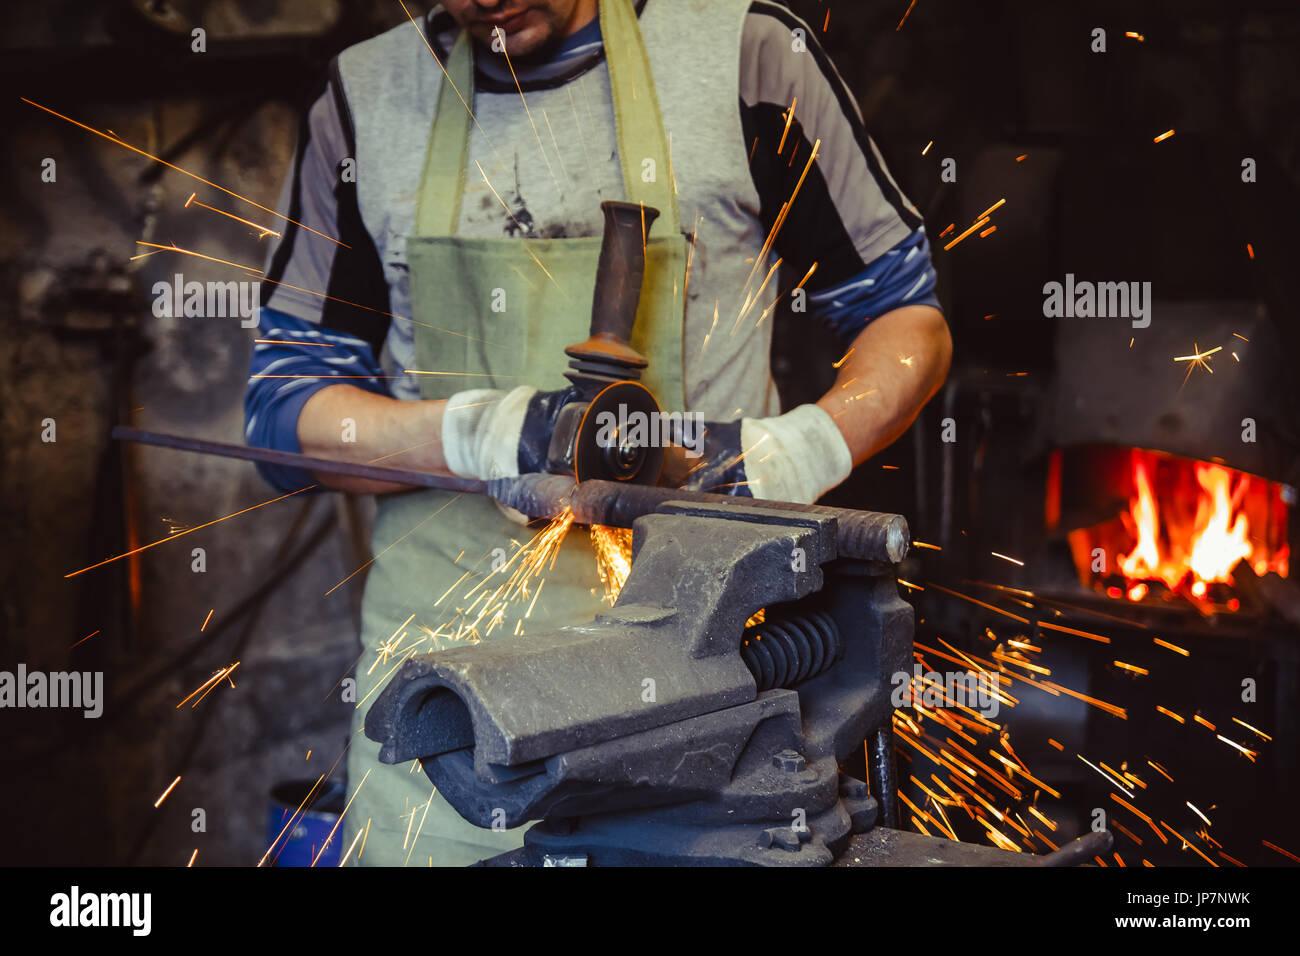 Craftsman sawing metal sparkles all around workshop. Working at noon. - Stock Image